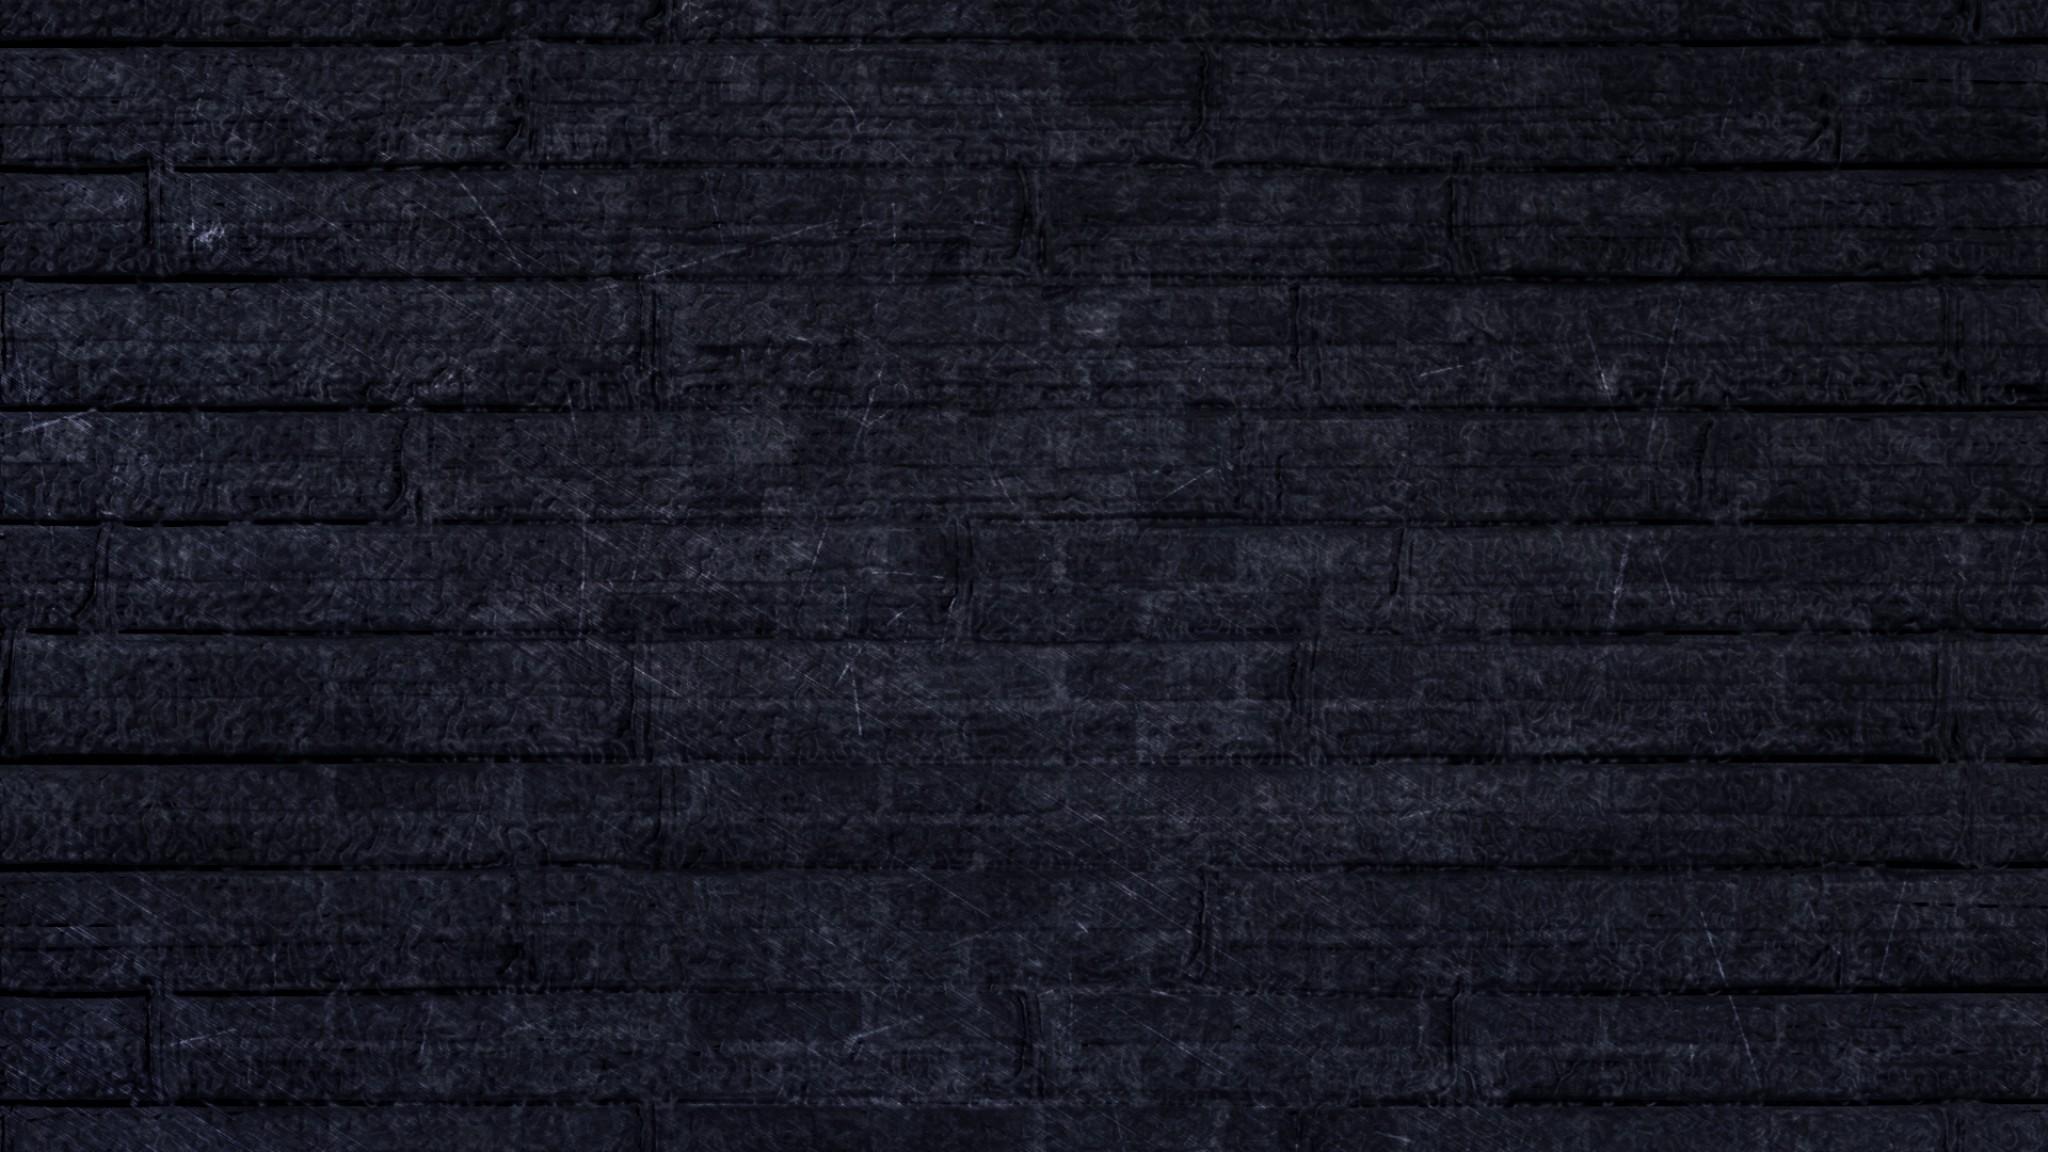 Wallpaper texture, stripes, black background